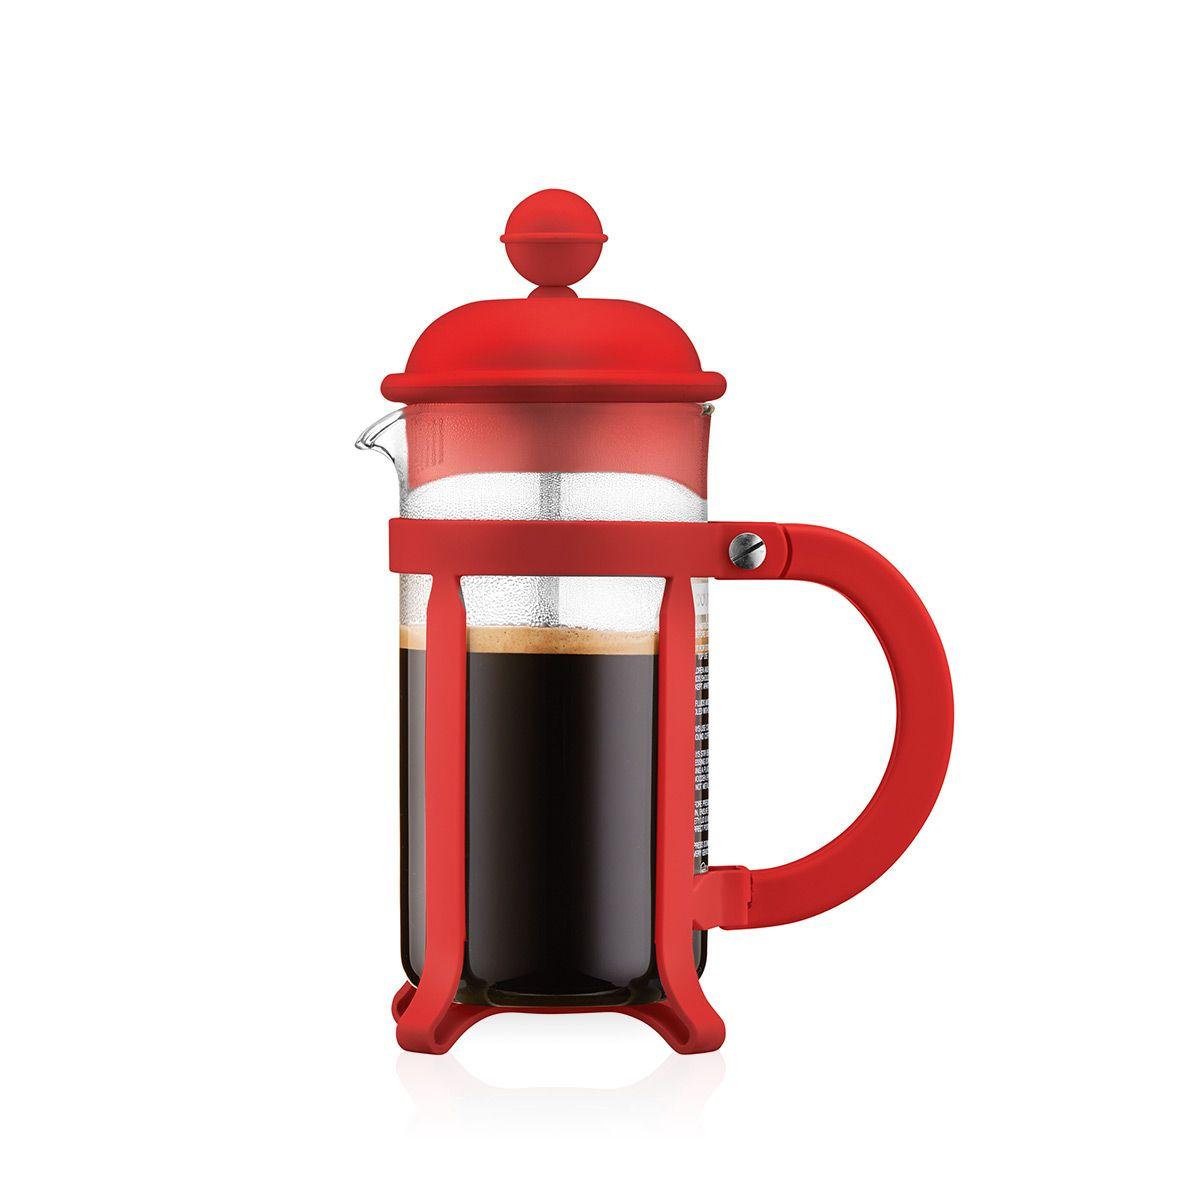 French Press Coffee Maker - Bodum